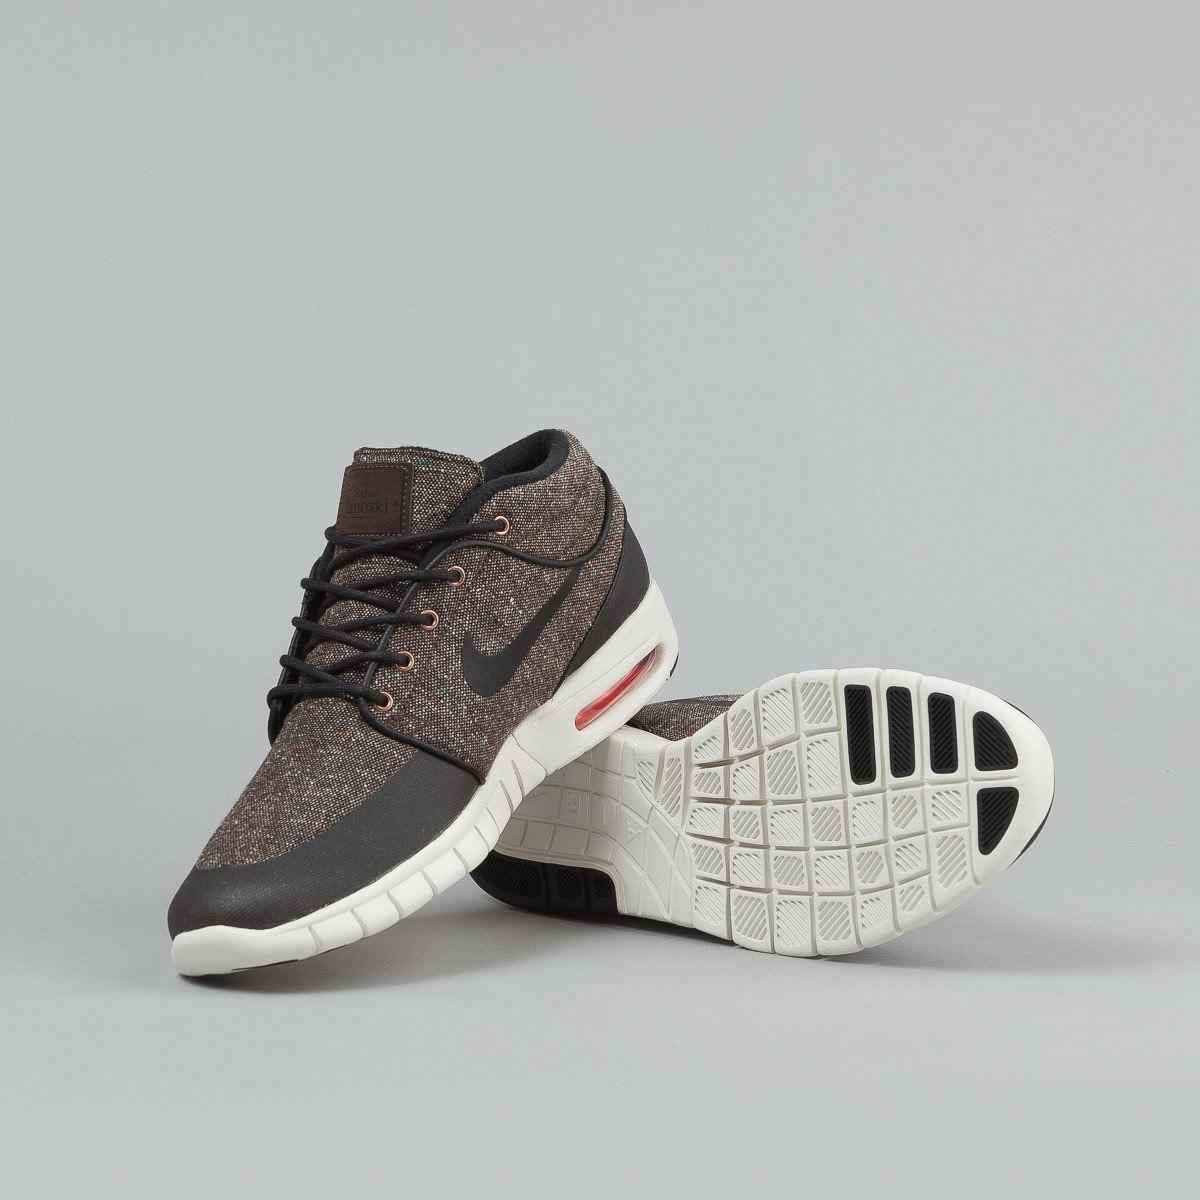 Janoski Air Mid Nike Max 06 Tenis Stefan uTPZkXwOi